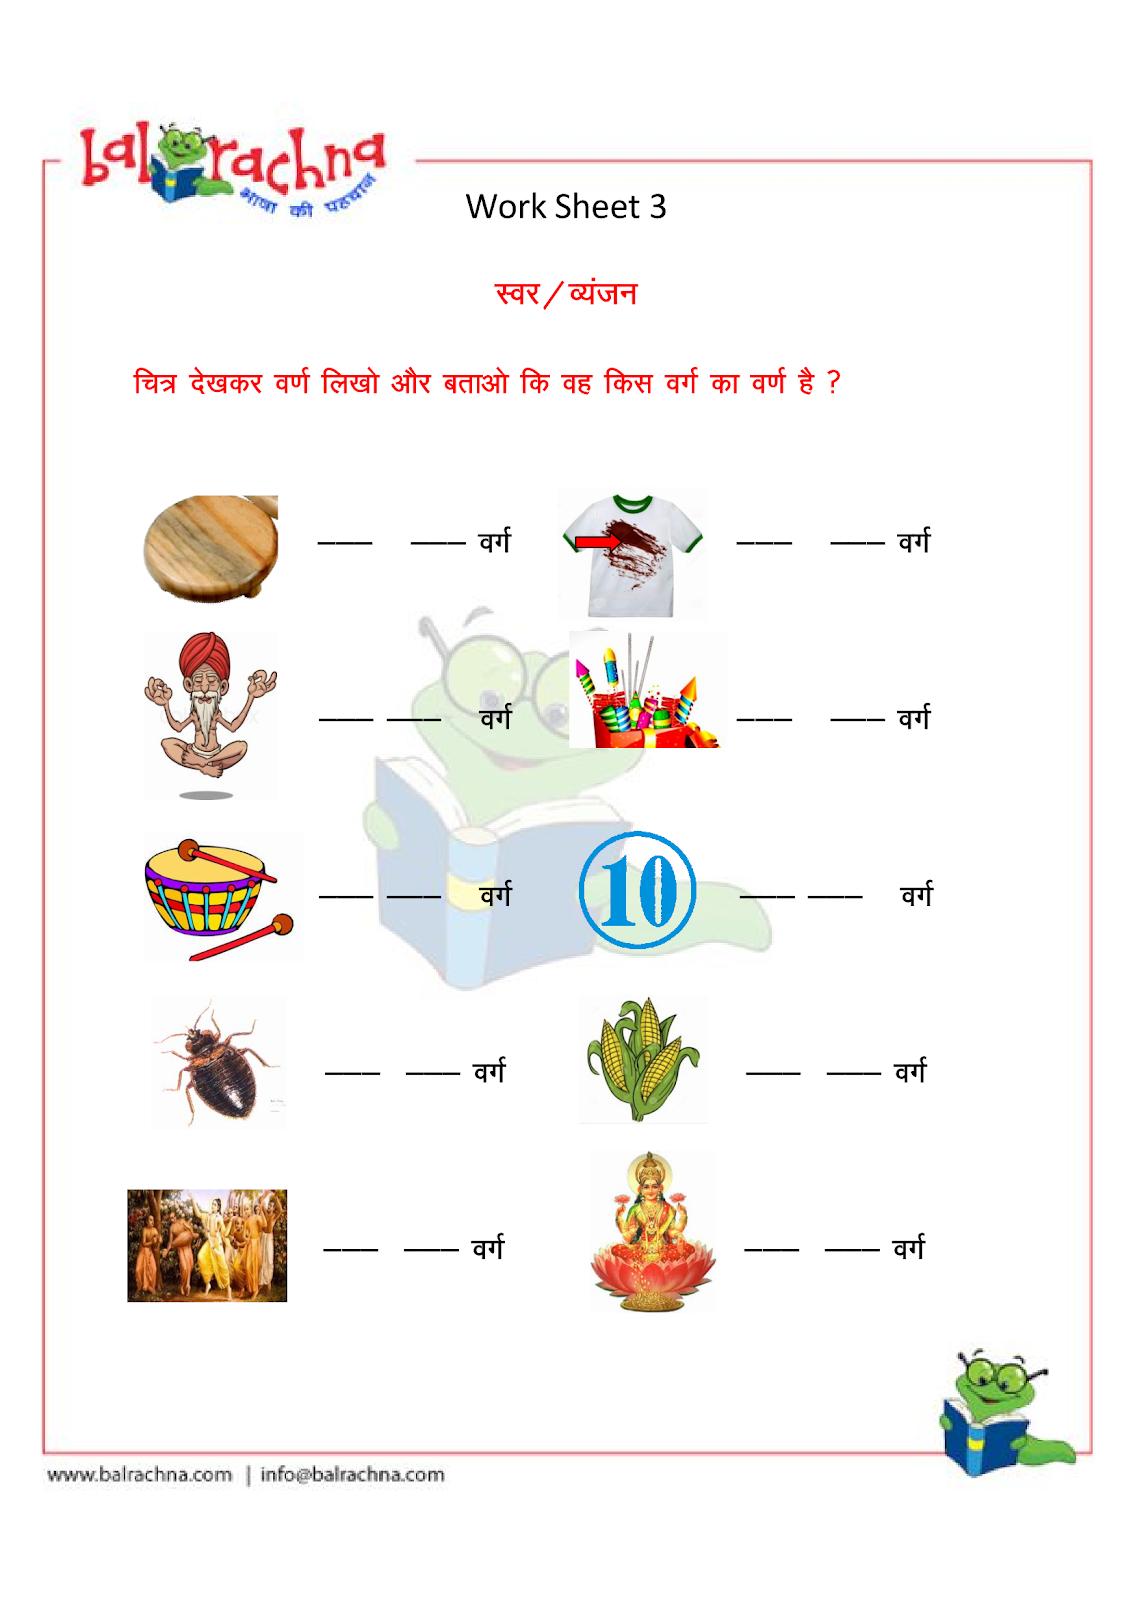 Balrachna Primary School Hindi Varnamala Swar Vyanjan Worksheets 3